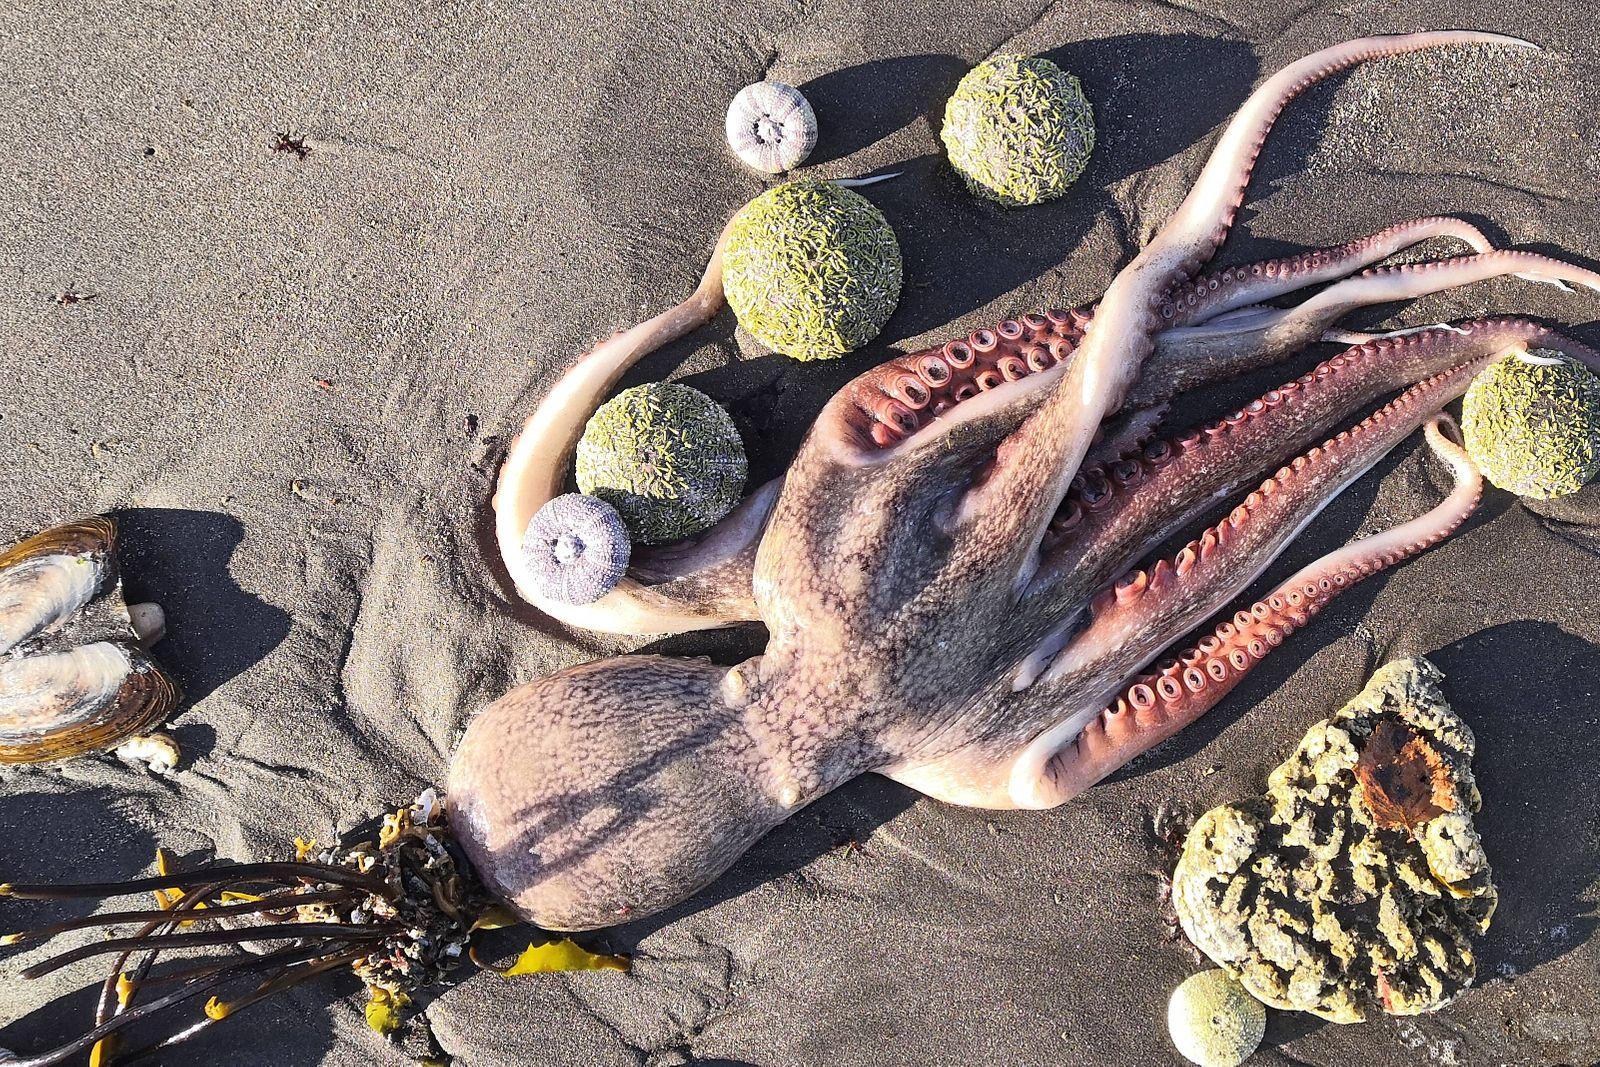 VILYUCHINSK, RUSSIA - OCTOBER 1, 2020: A dead octopus on the shore of the Bezymyannaya Bay. Many dead marine animals ar